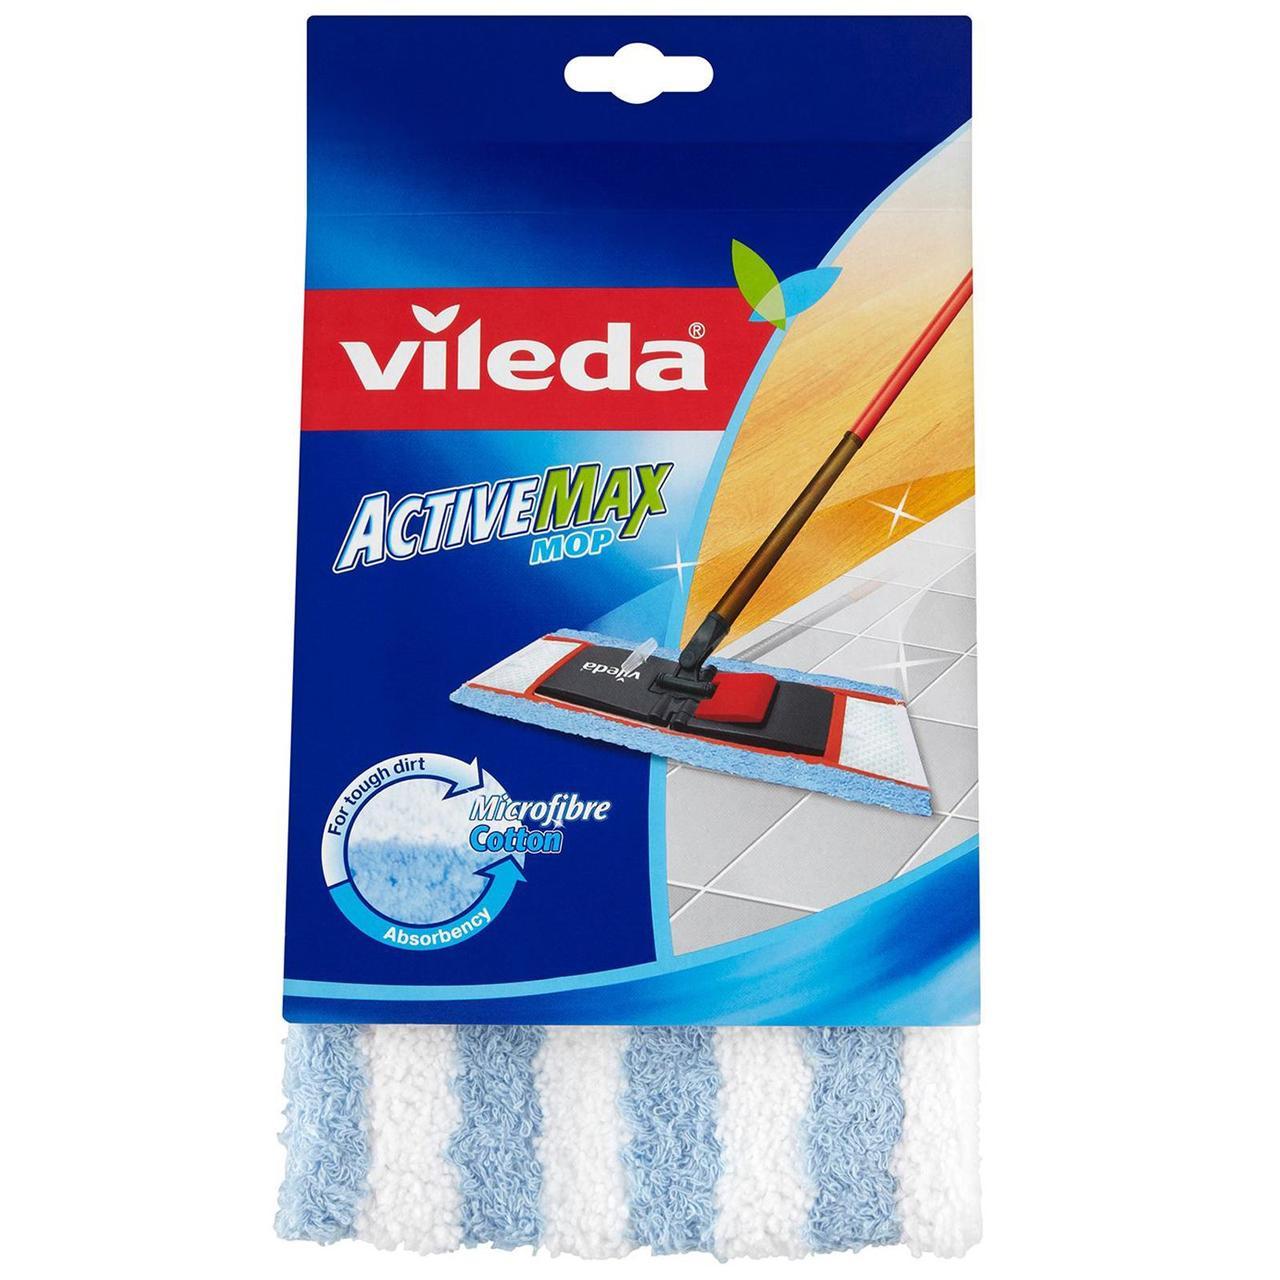 Змінний моп для швабри Active Max, Vileda, 1 шт.